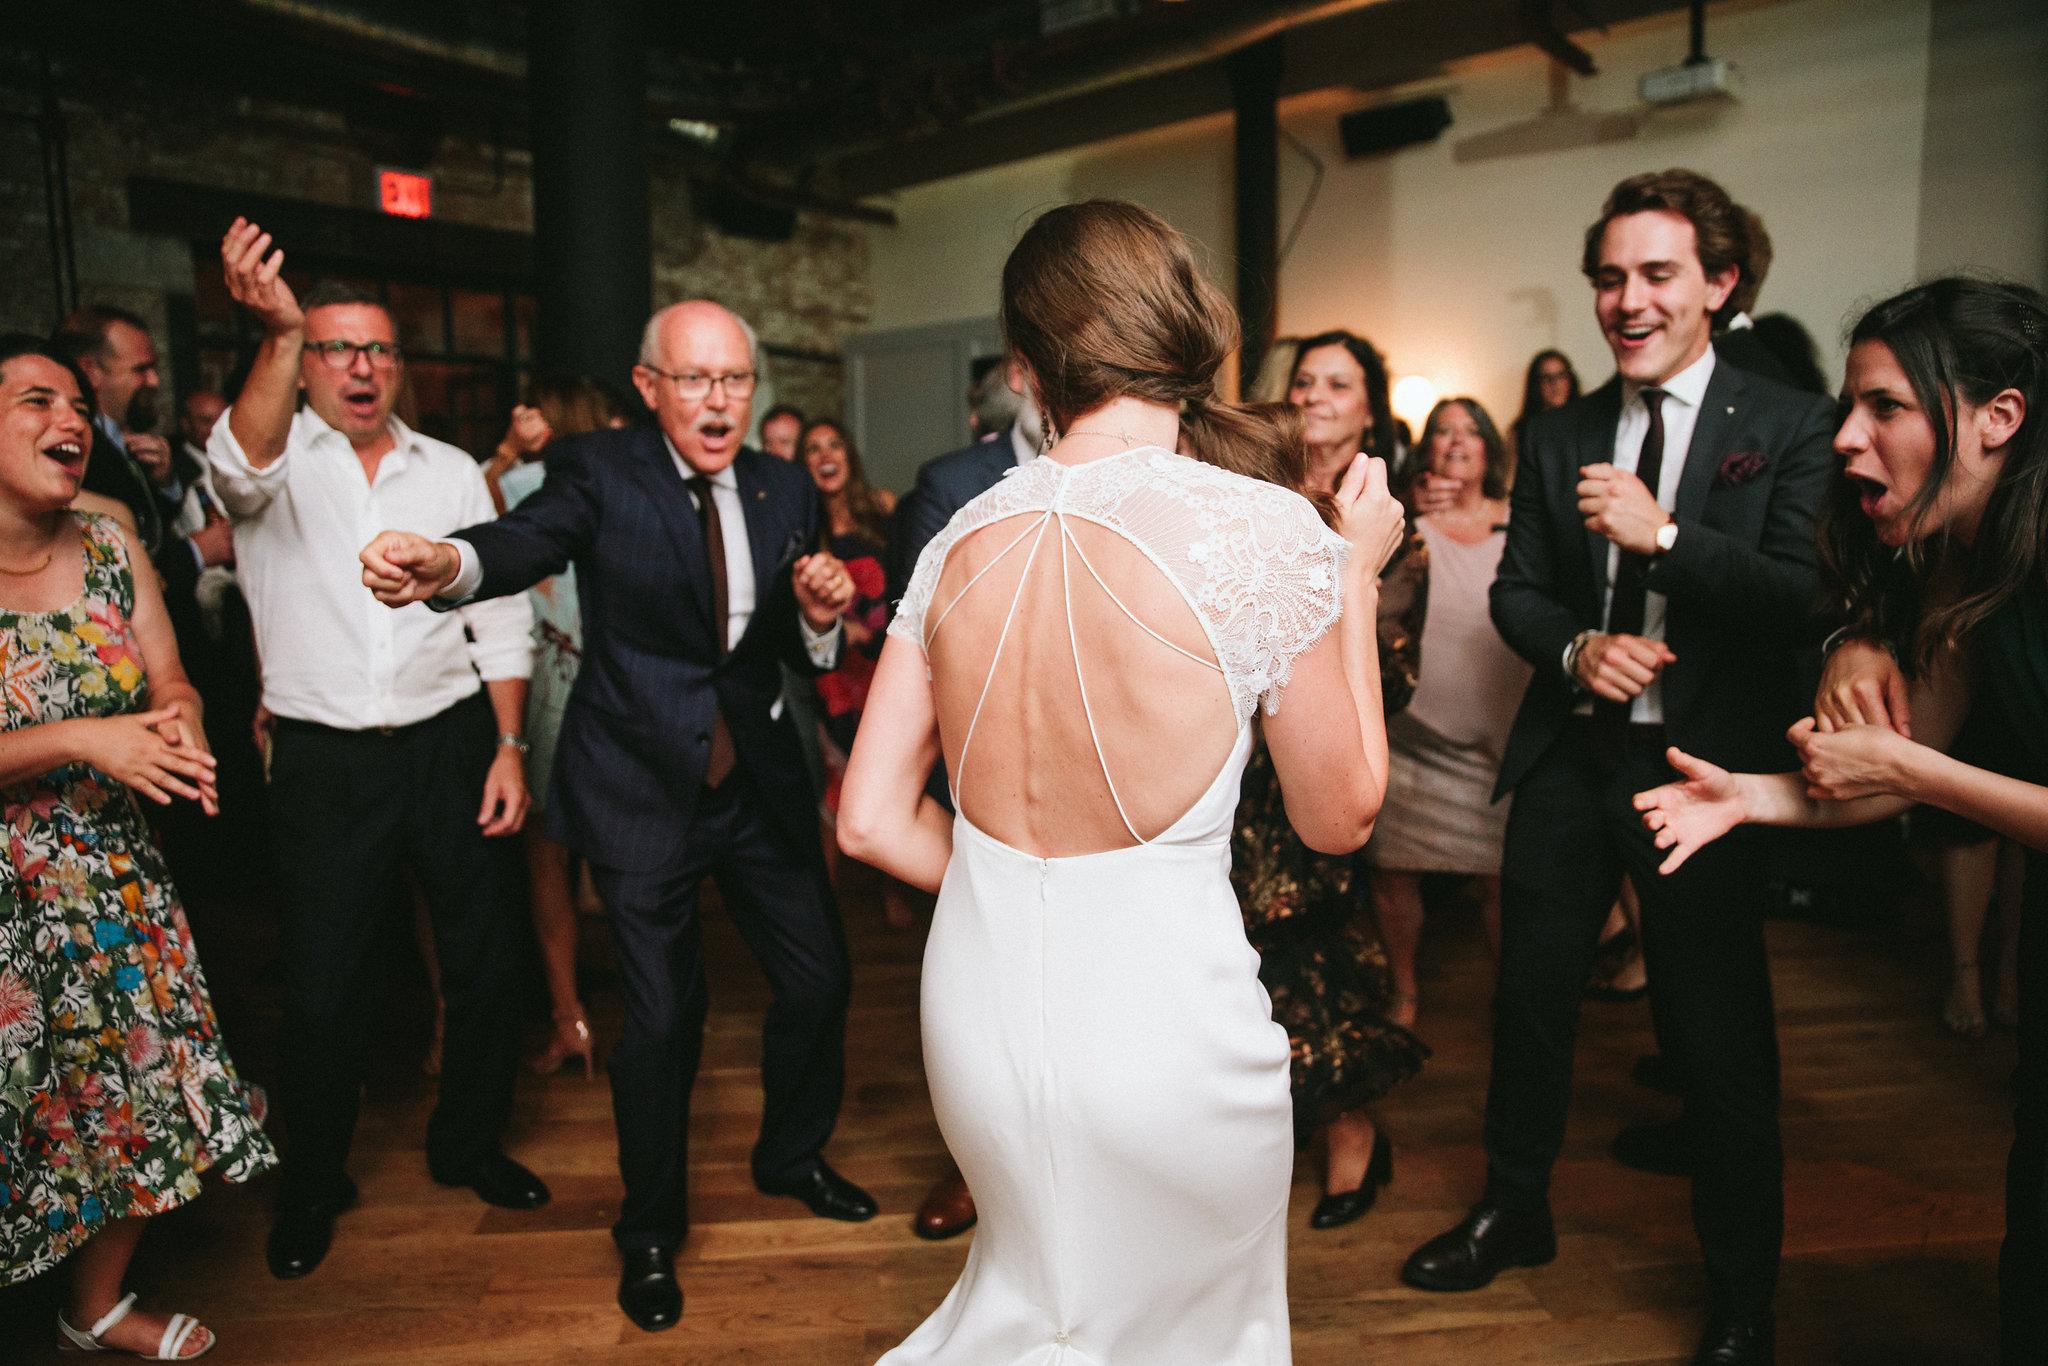 S+M-wythe-wedding-jove-meyer-events-0155.jpg